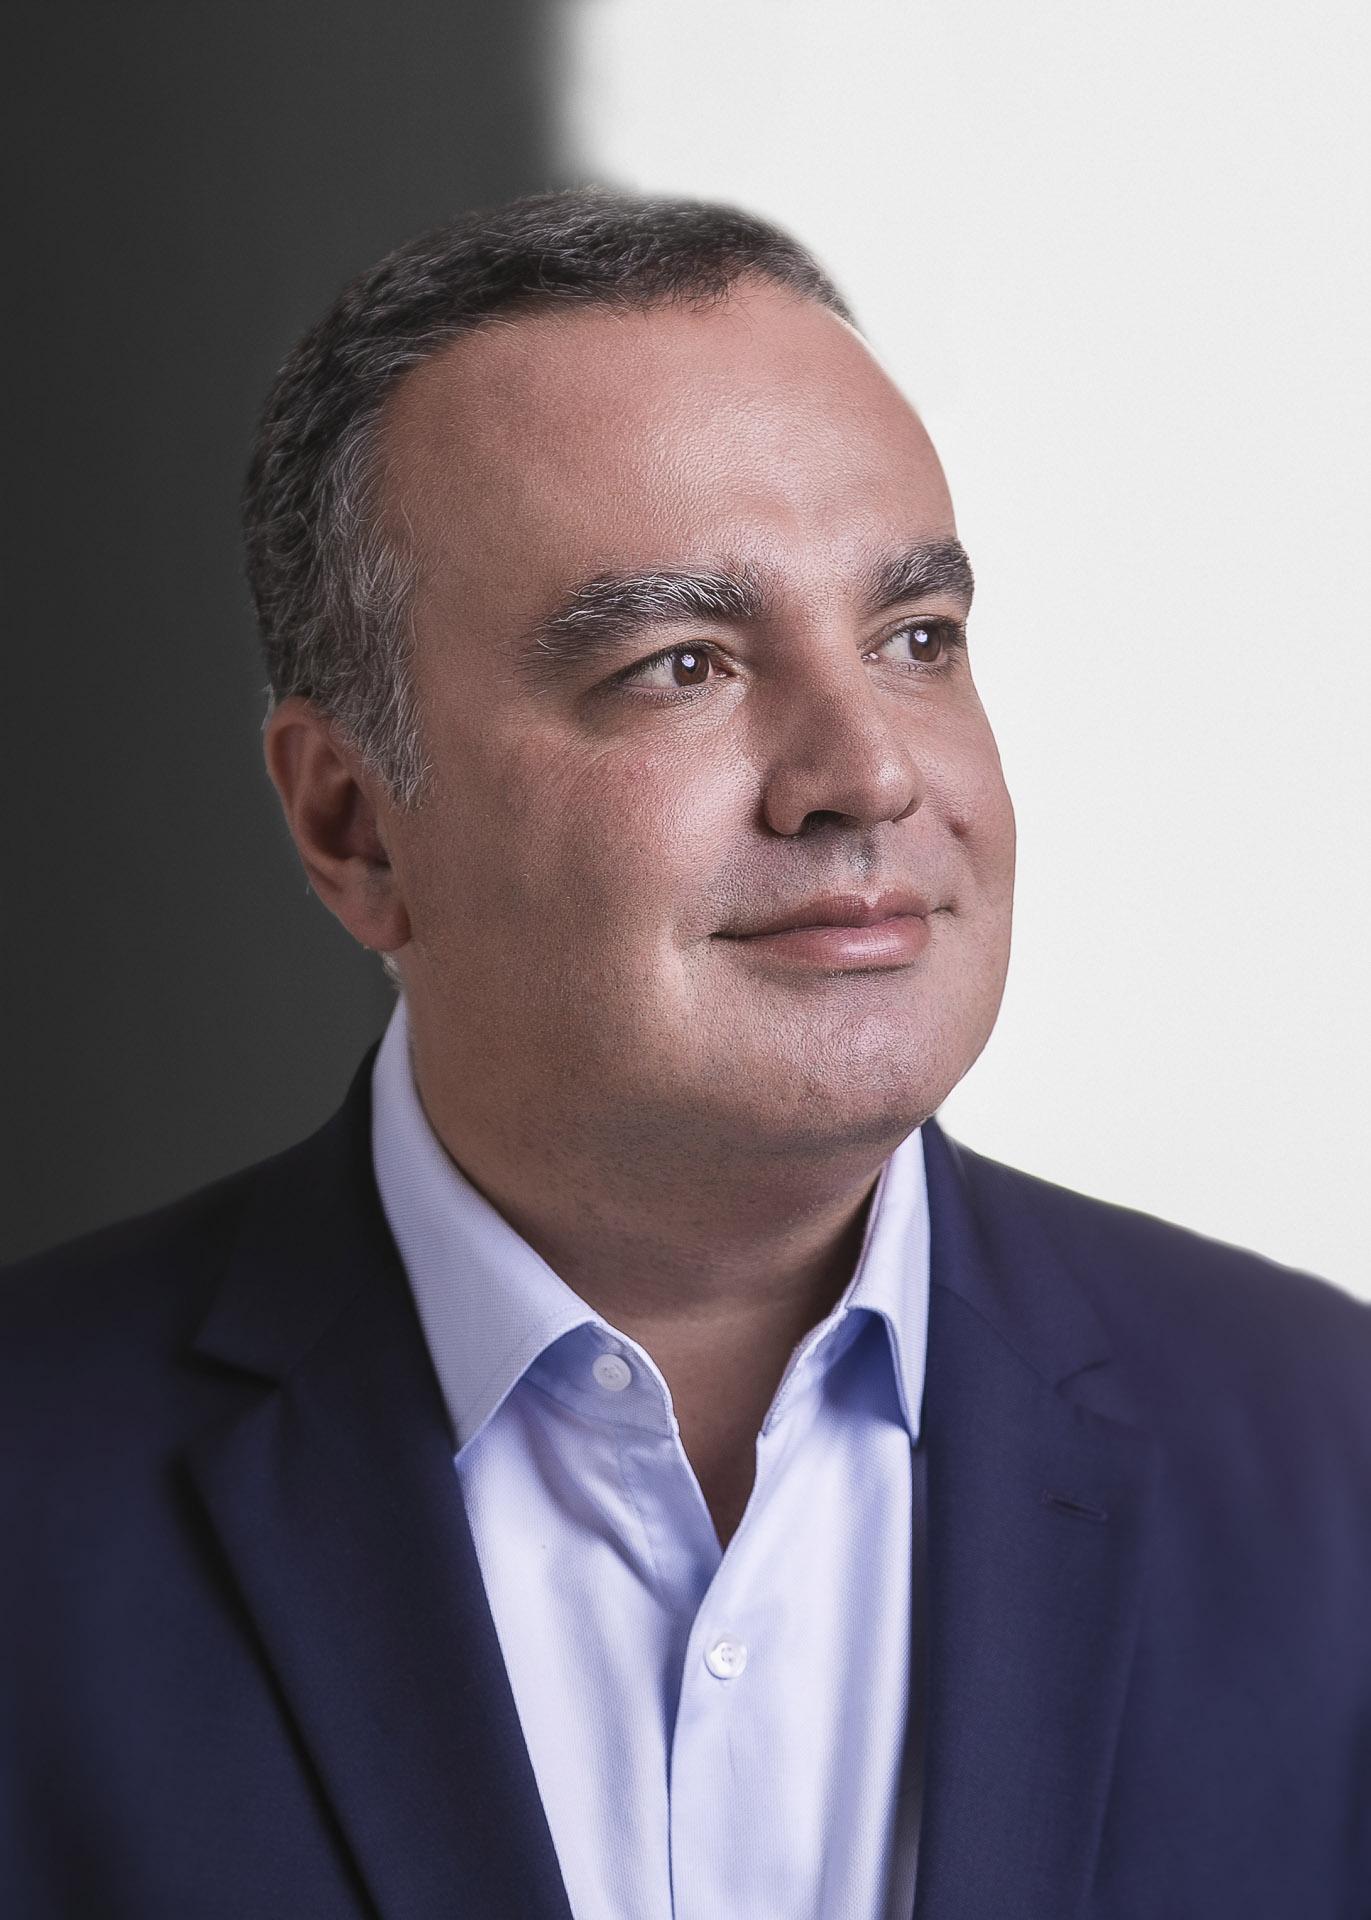 Felipe Chad